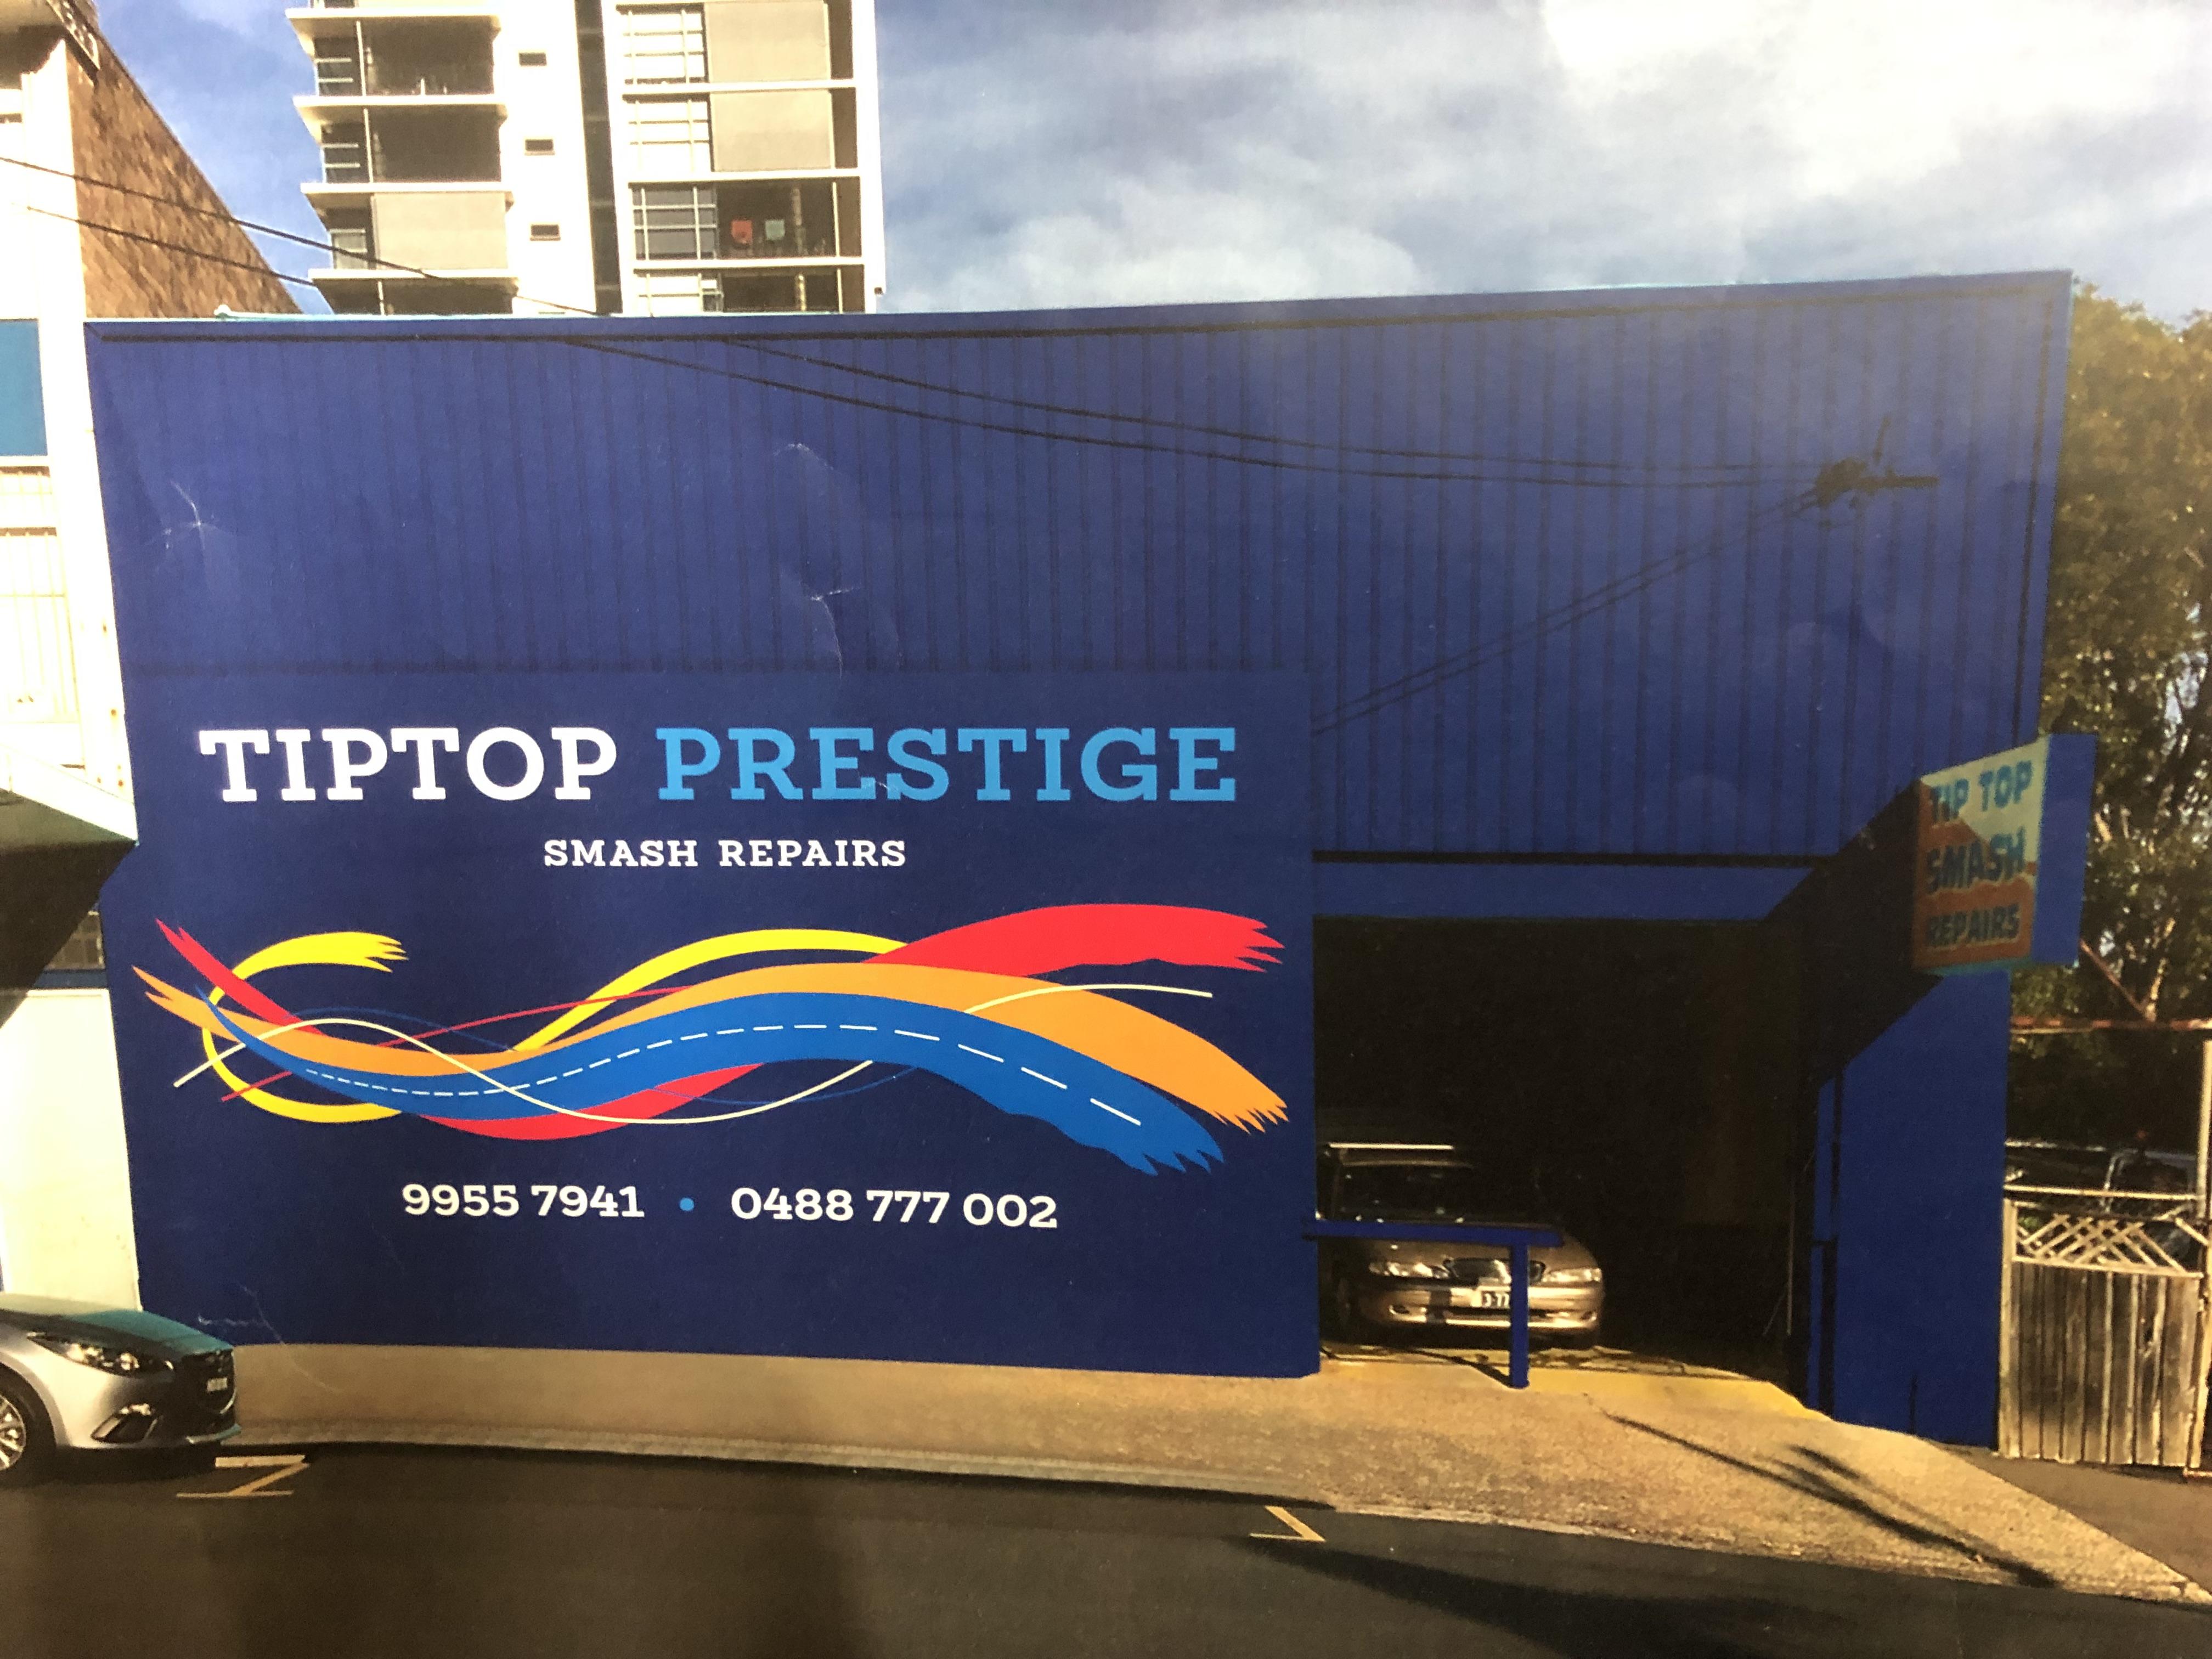 Tip Top Prestige Smash Repairs Photos